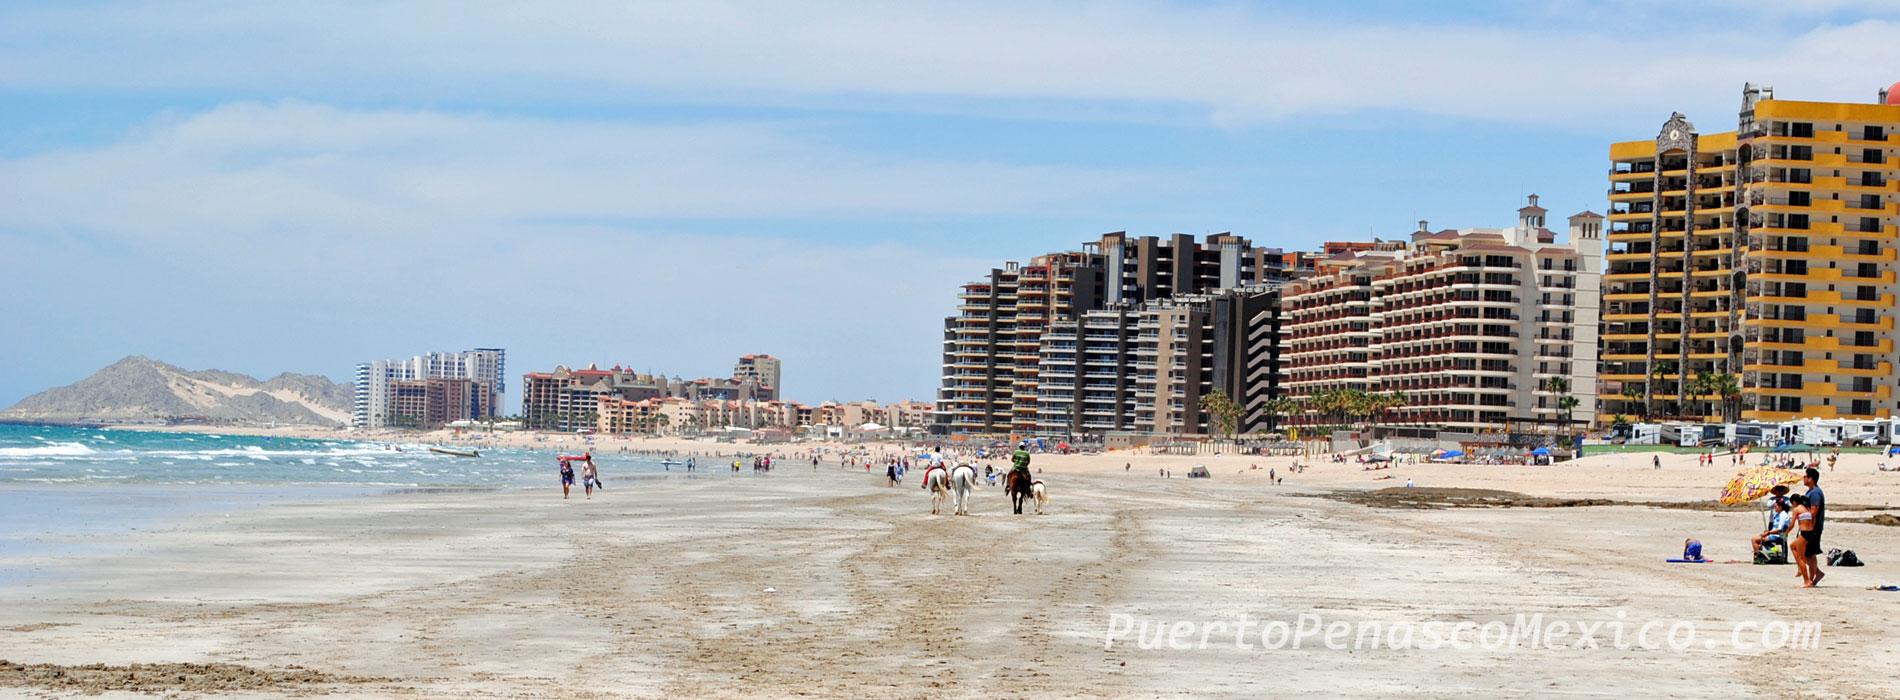 Puerto Penasco Hotels & Resorts